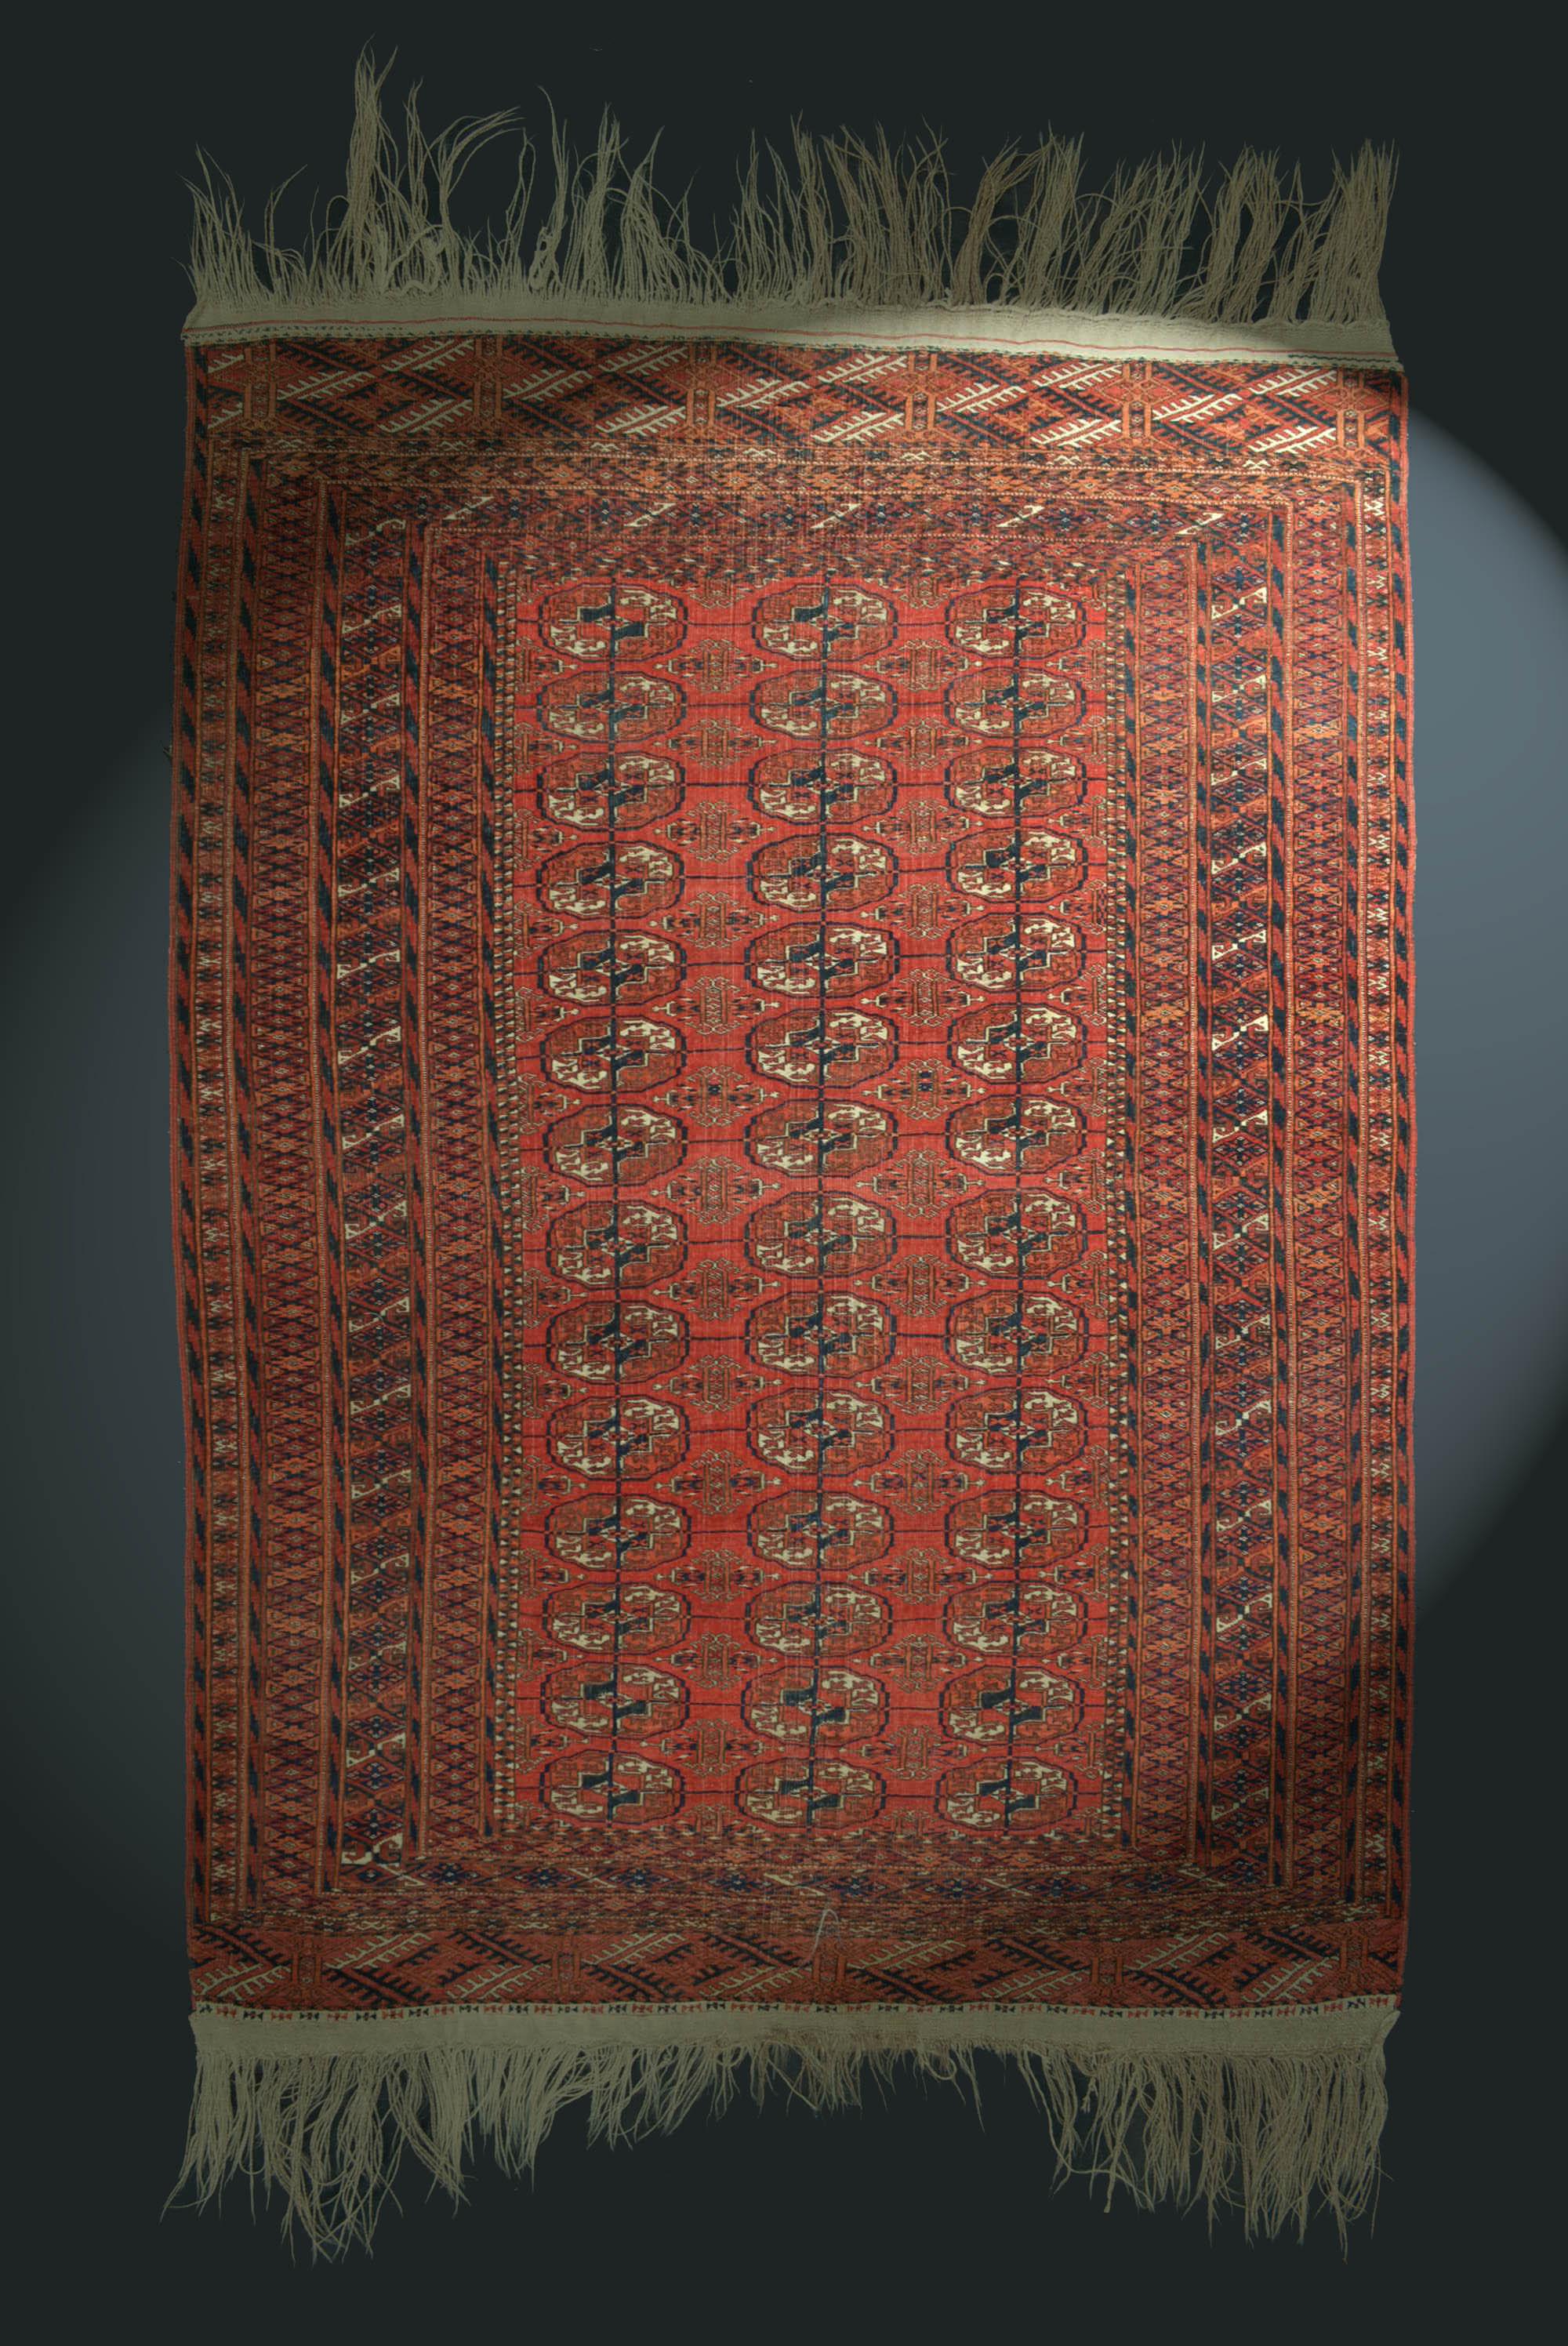 antik buchara teppich turkmenistan 170x124cm feiner tekke rug tapis tappeto ebay. Black Bedroom Furniture Sets. Home Design Ideas